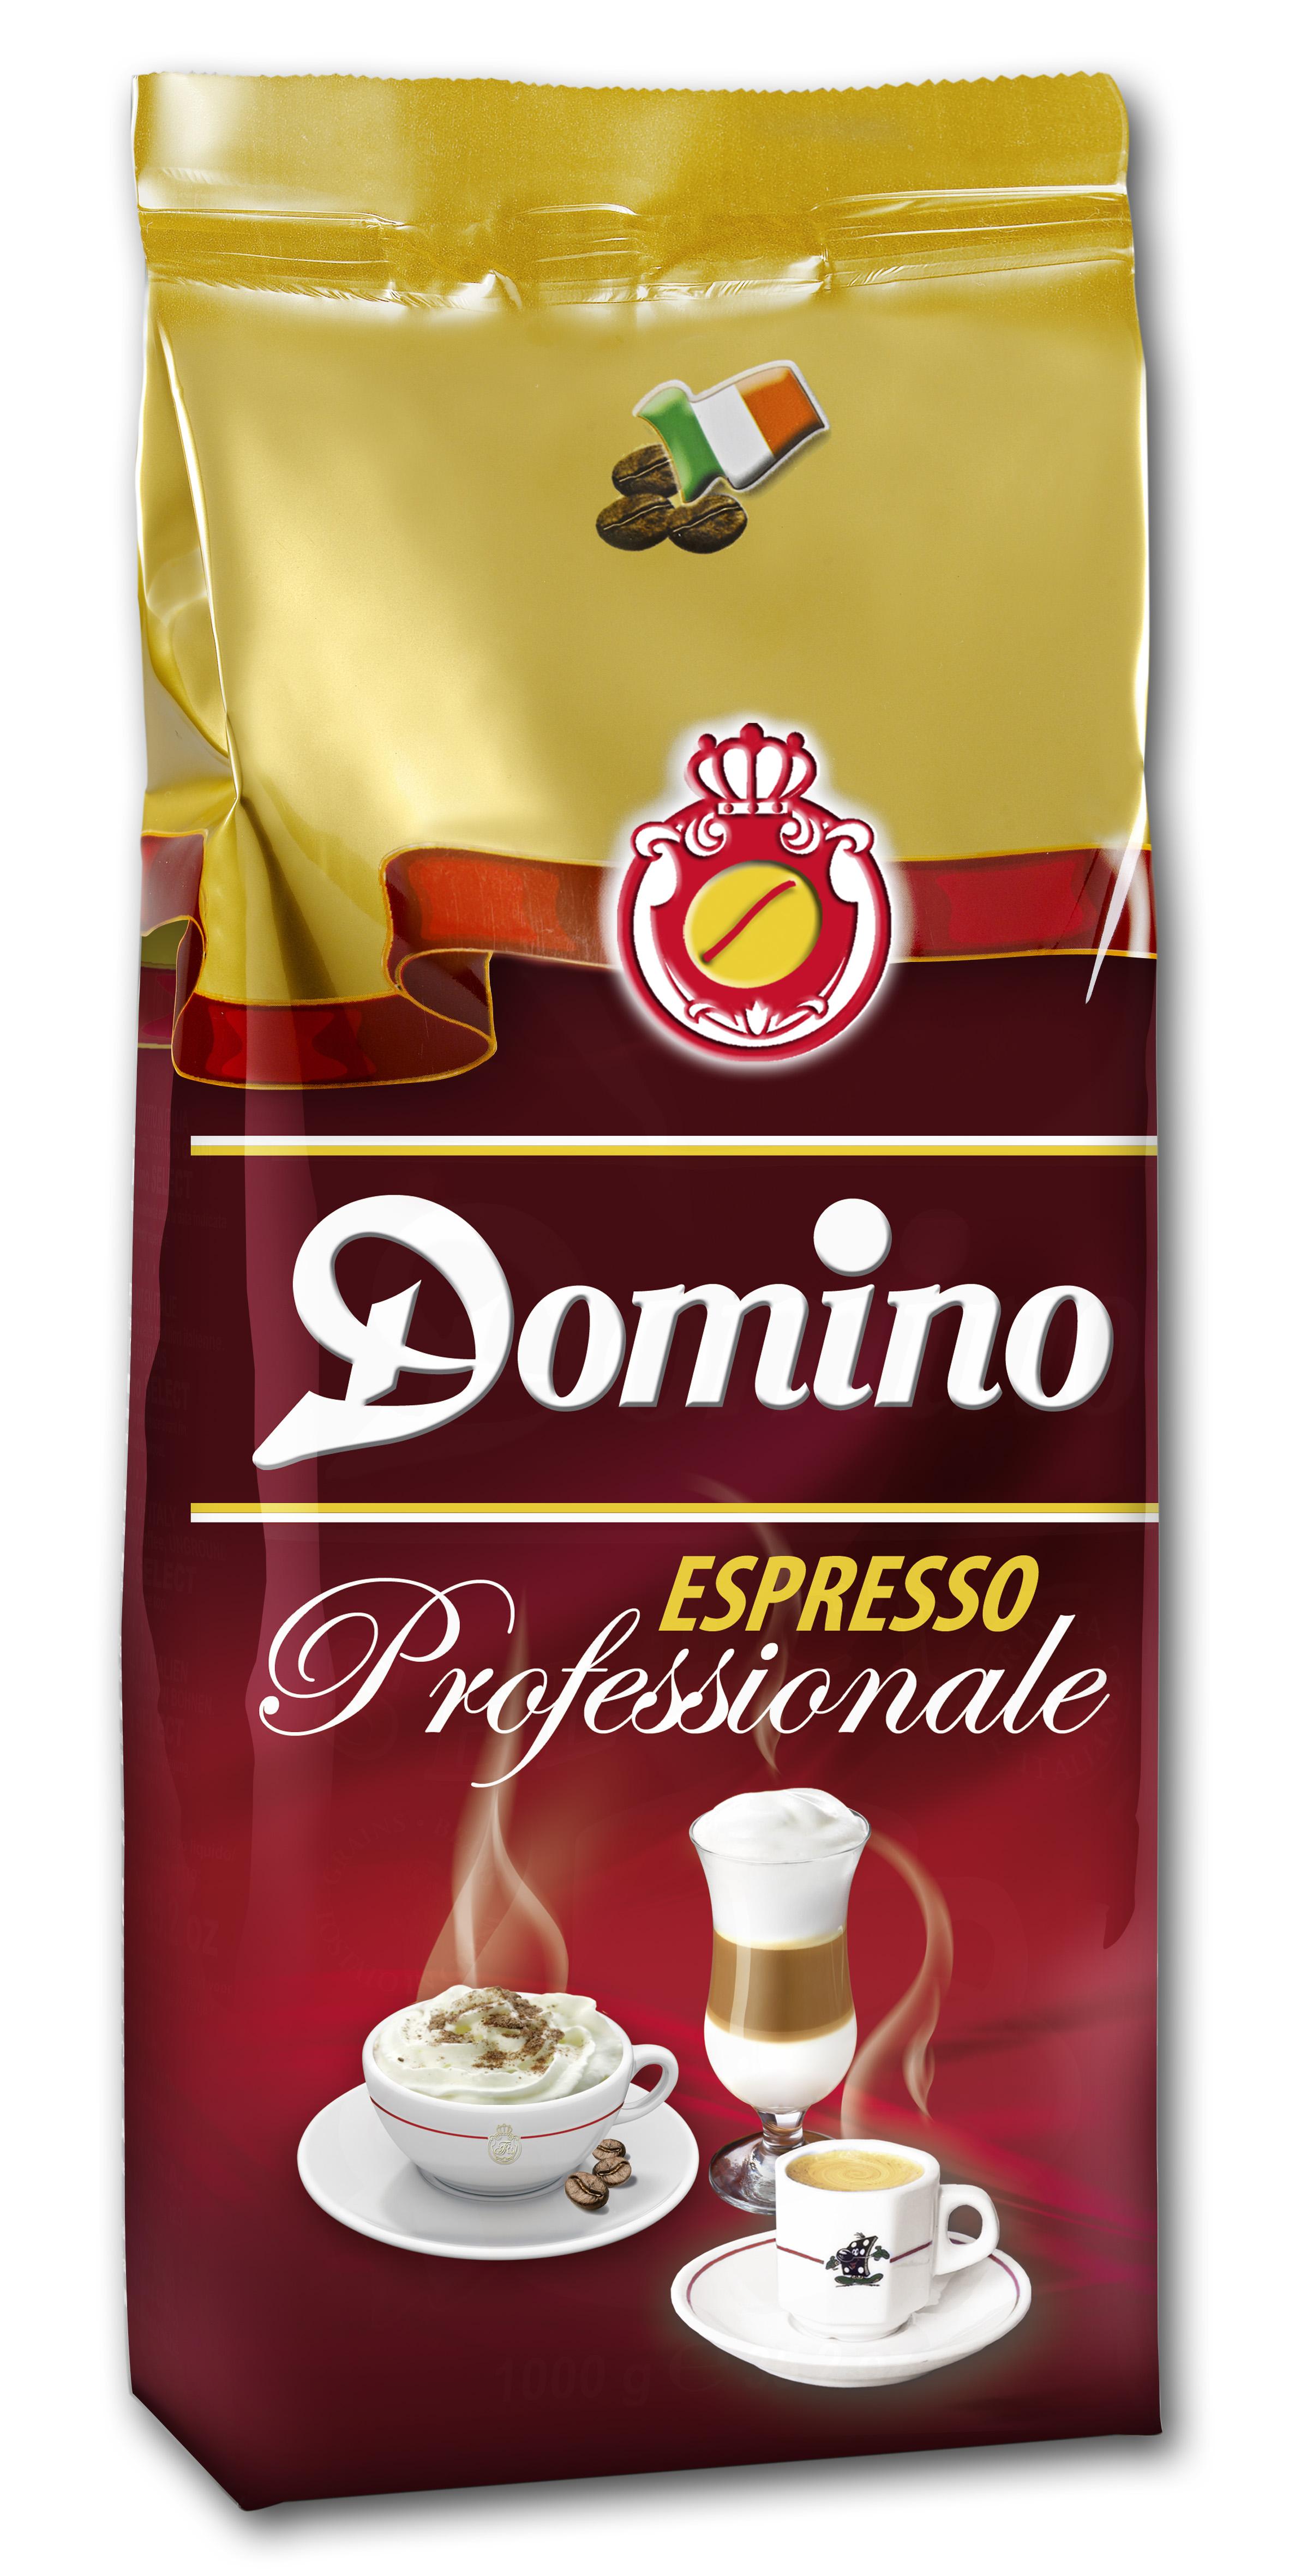 DOMINO PROFESSIONALE.jpg